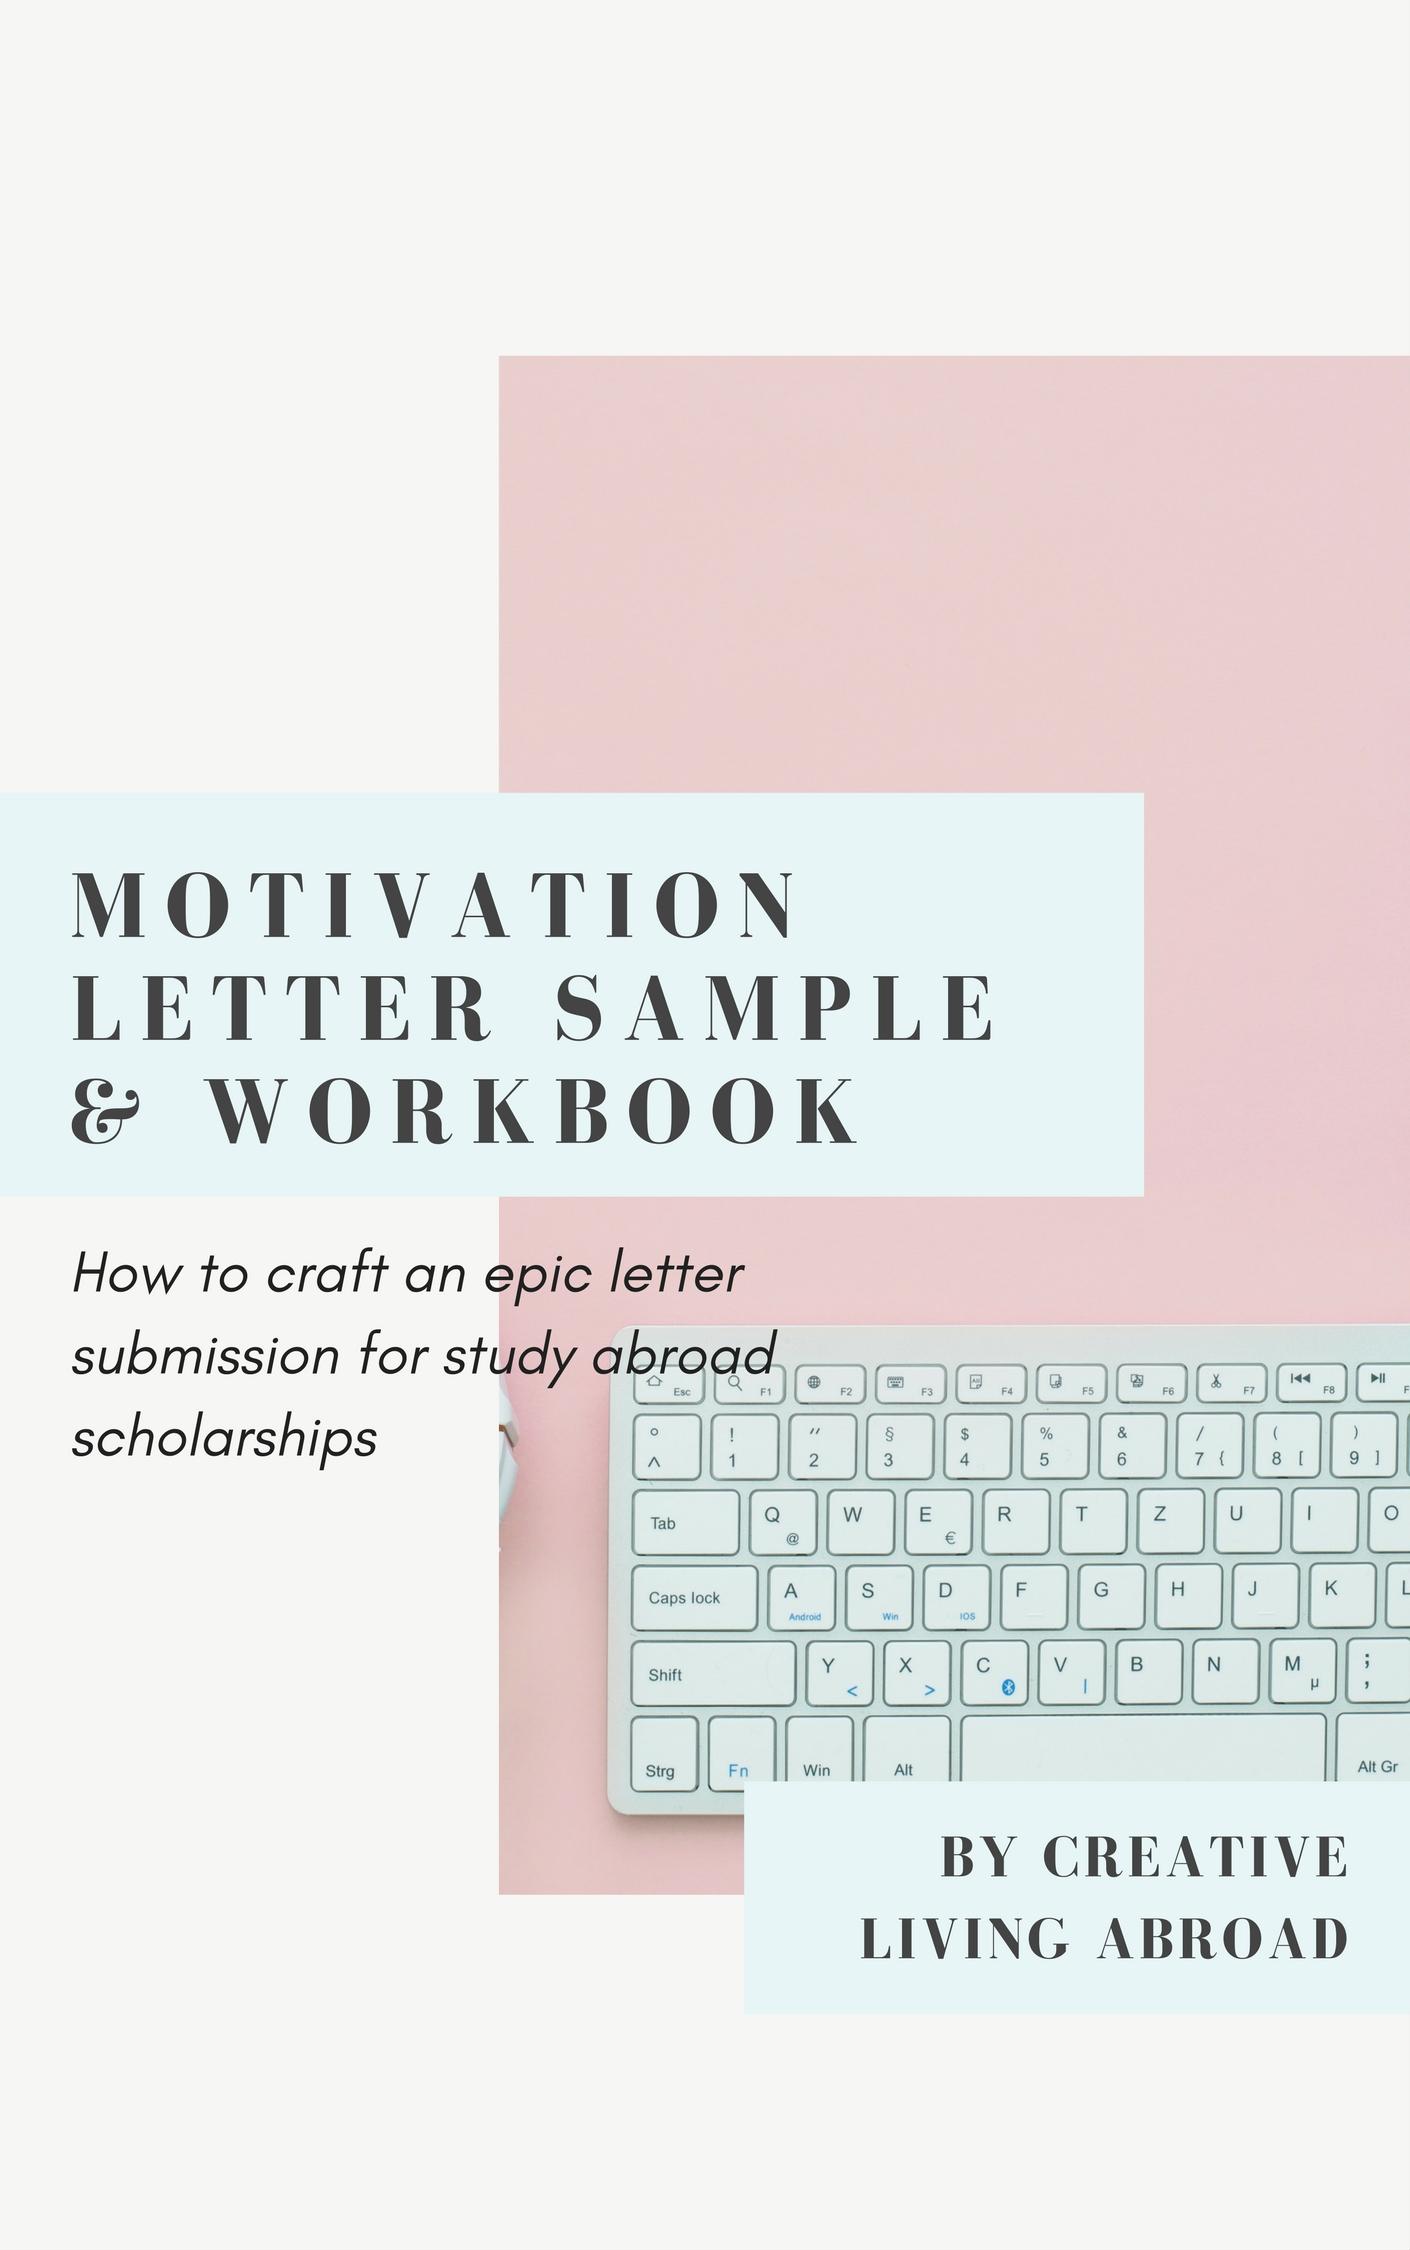 motivation letter workbook for scholarship applications